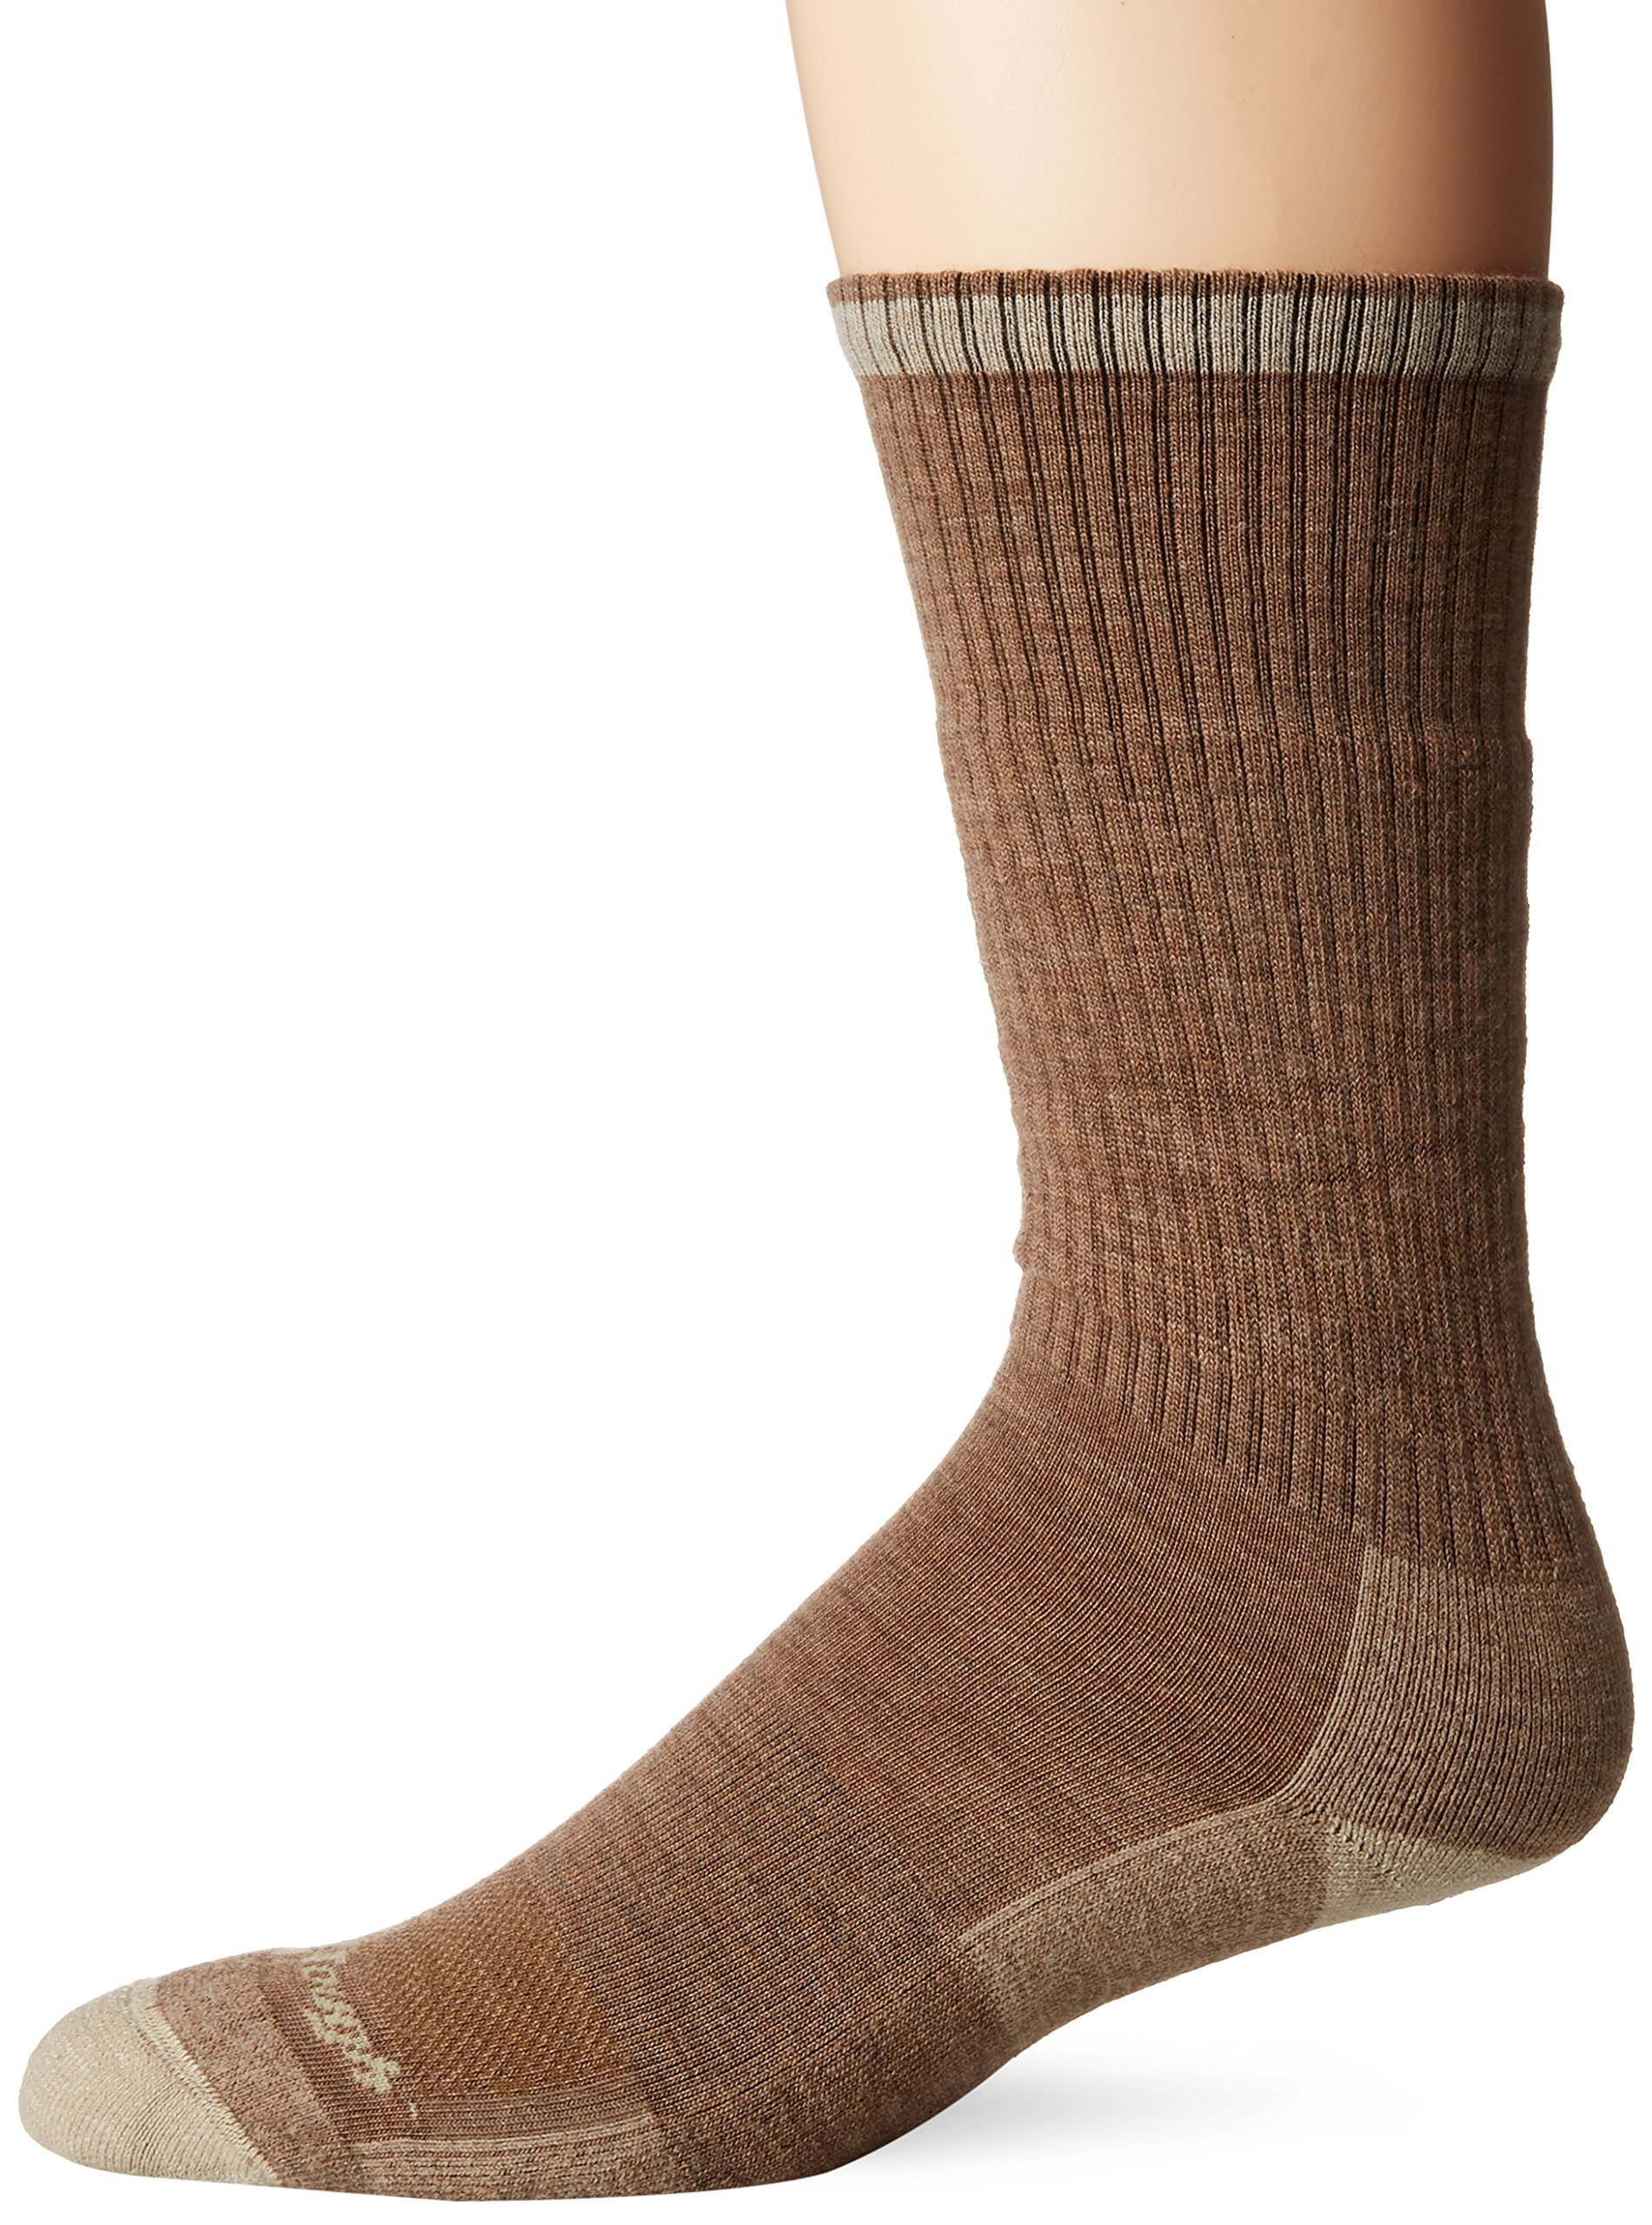 Darn Tough Vermont Men's John Henry Boot Cushion Socks, Sand, XL by Darn Tough